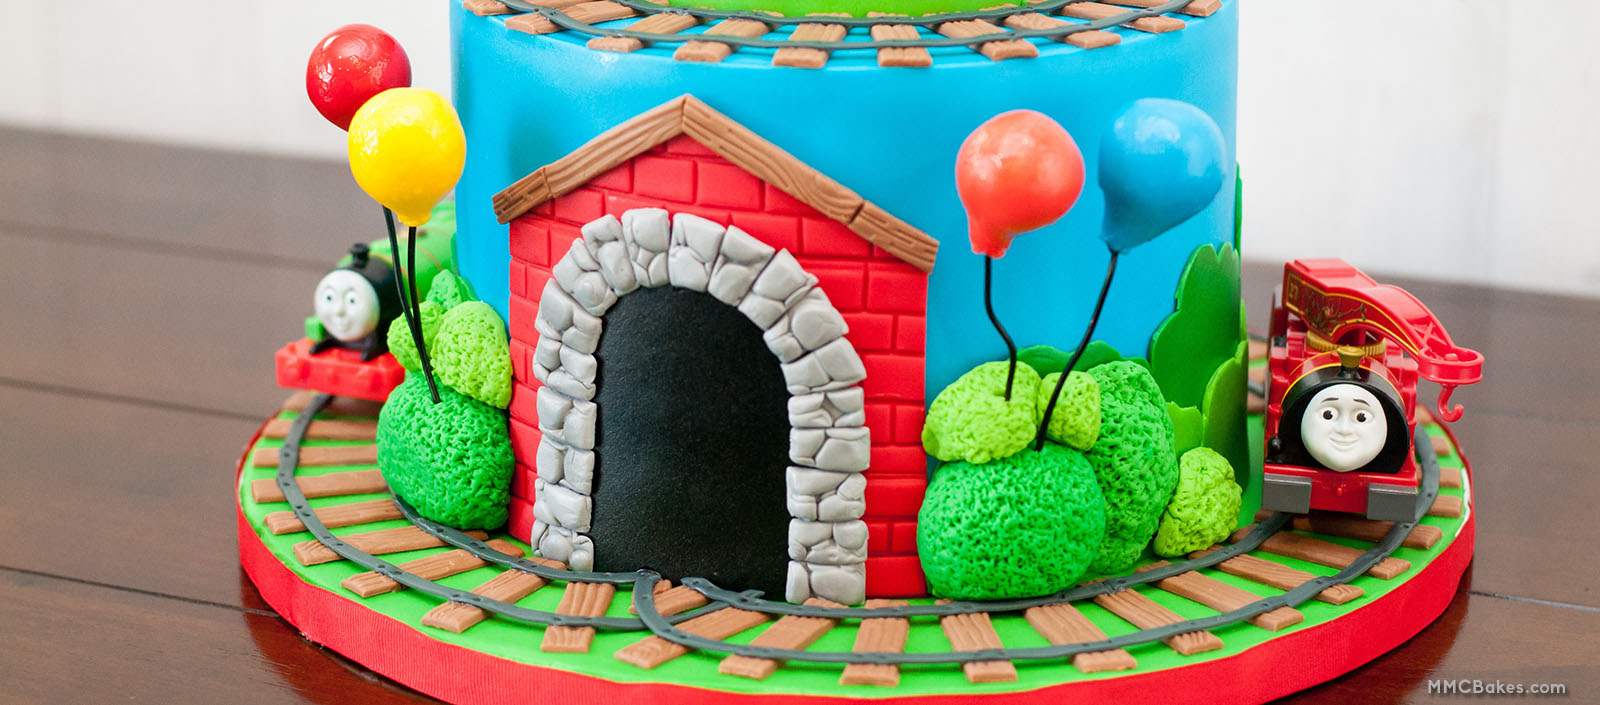 Mmc Bakes Custom Cakes Thomas The Train And Friends Cake San Diego Chula Vista